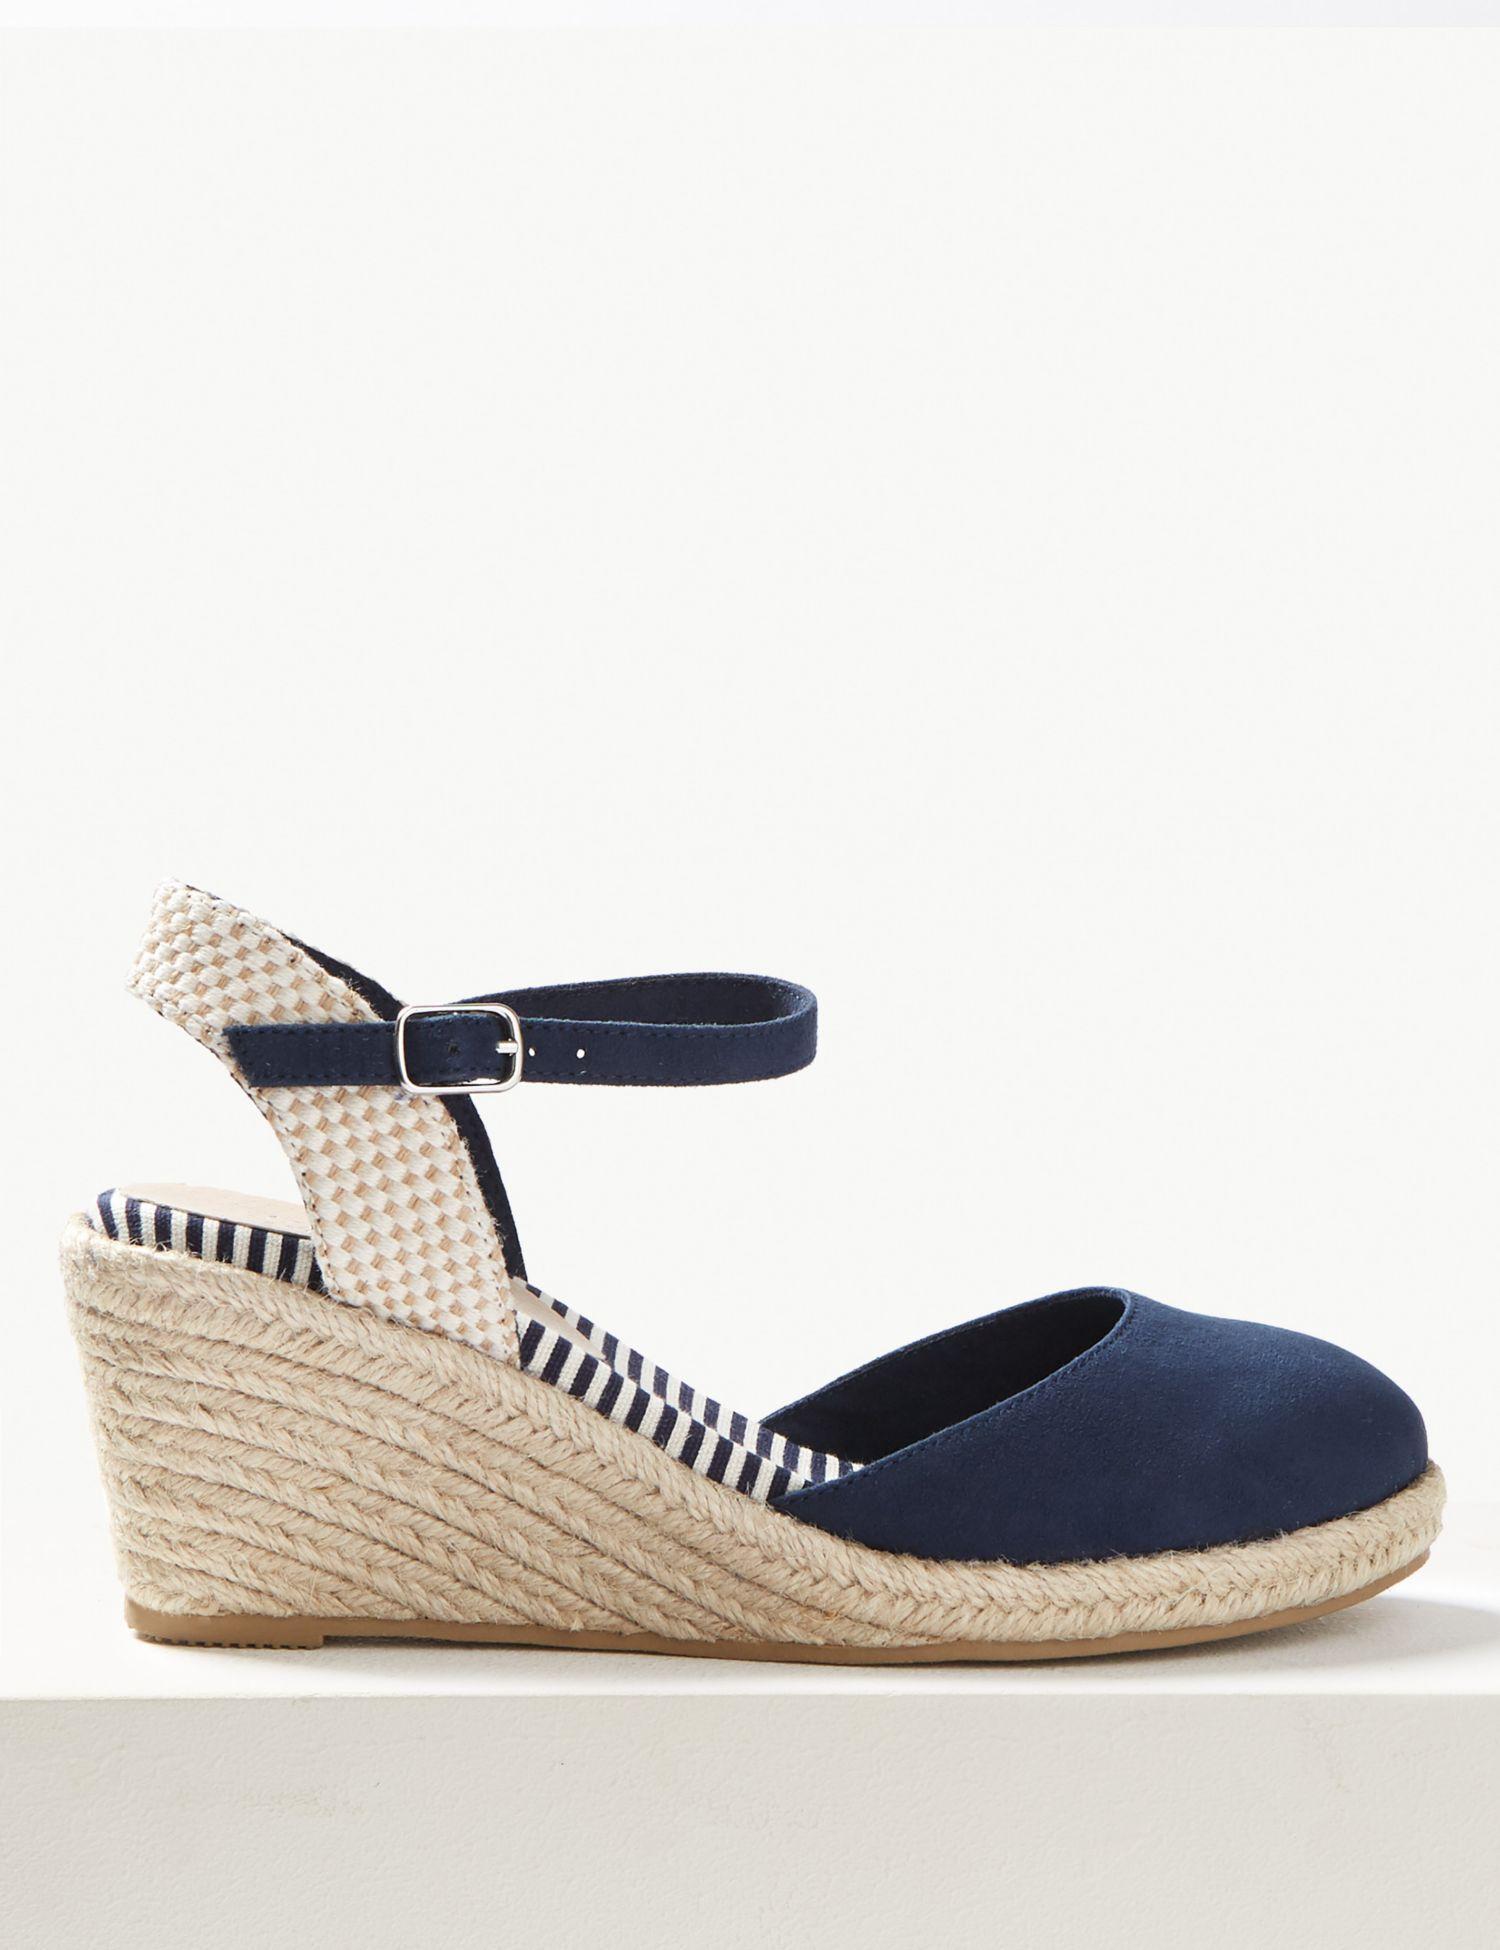 62f3eeeb68f Marks & Spencer Wedge Heel Almond Toe Espadrilles in Blue - Lyst